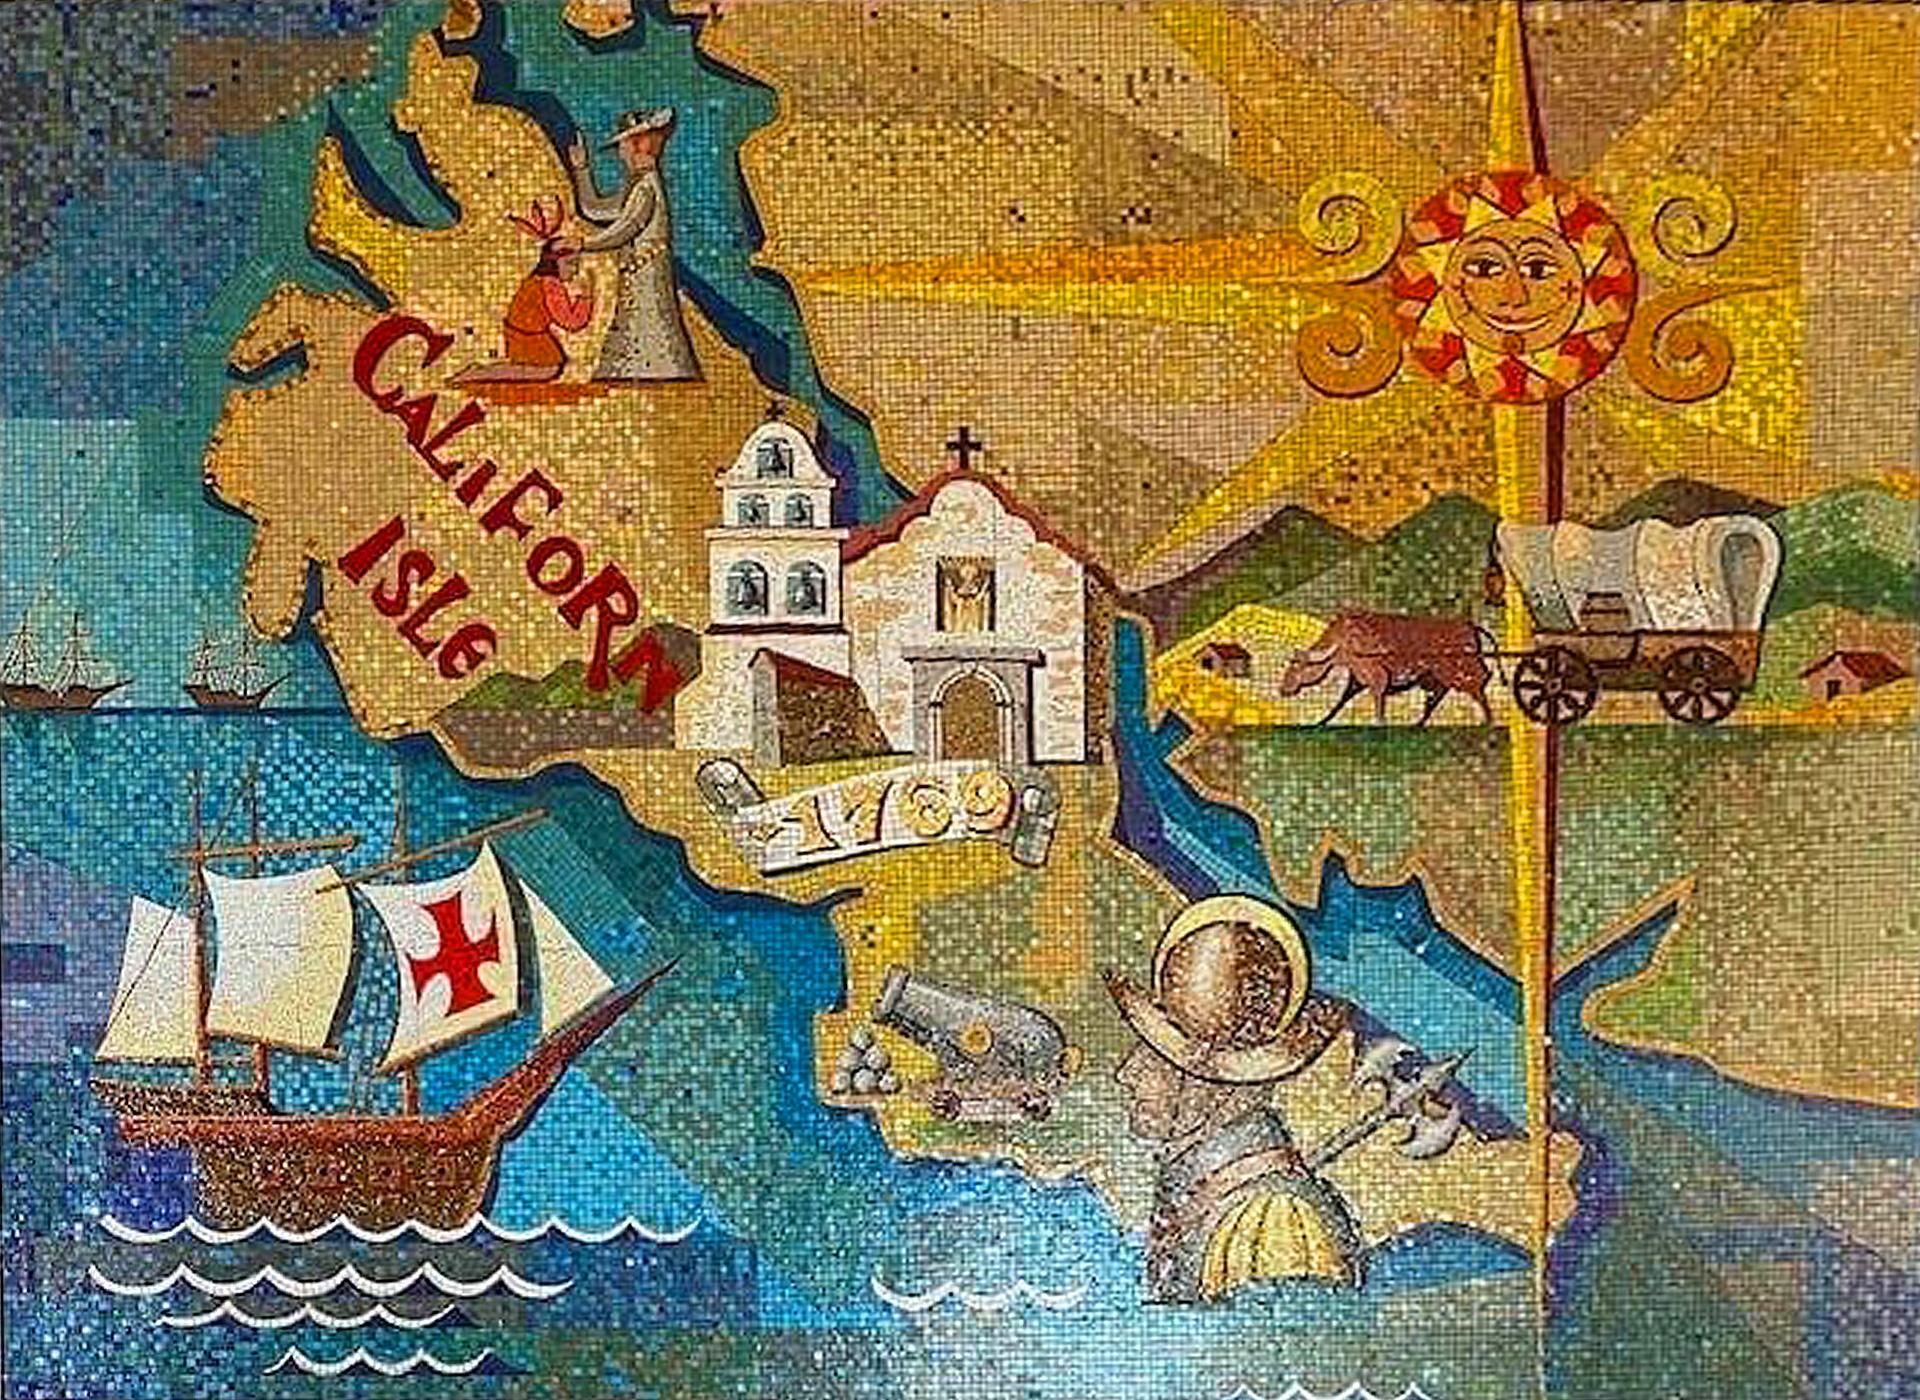 2021-Town-and-Country-Atlas-Ballroom-mural-closeup